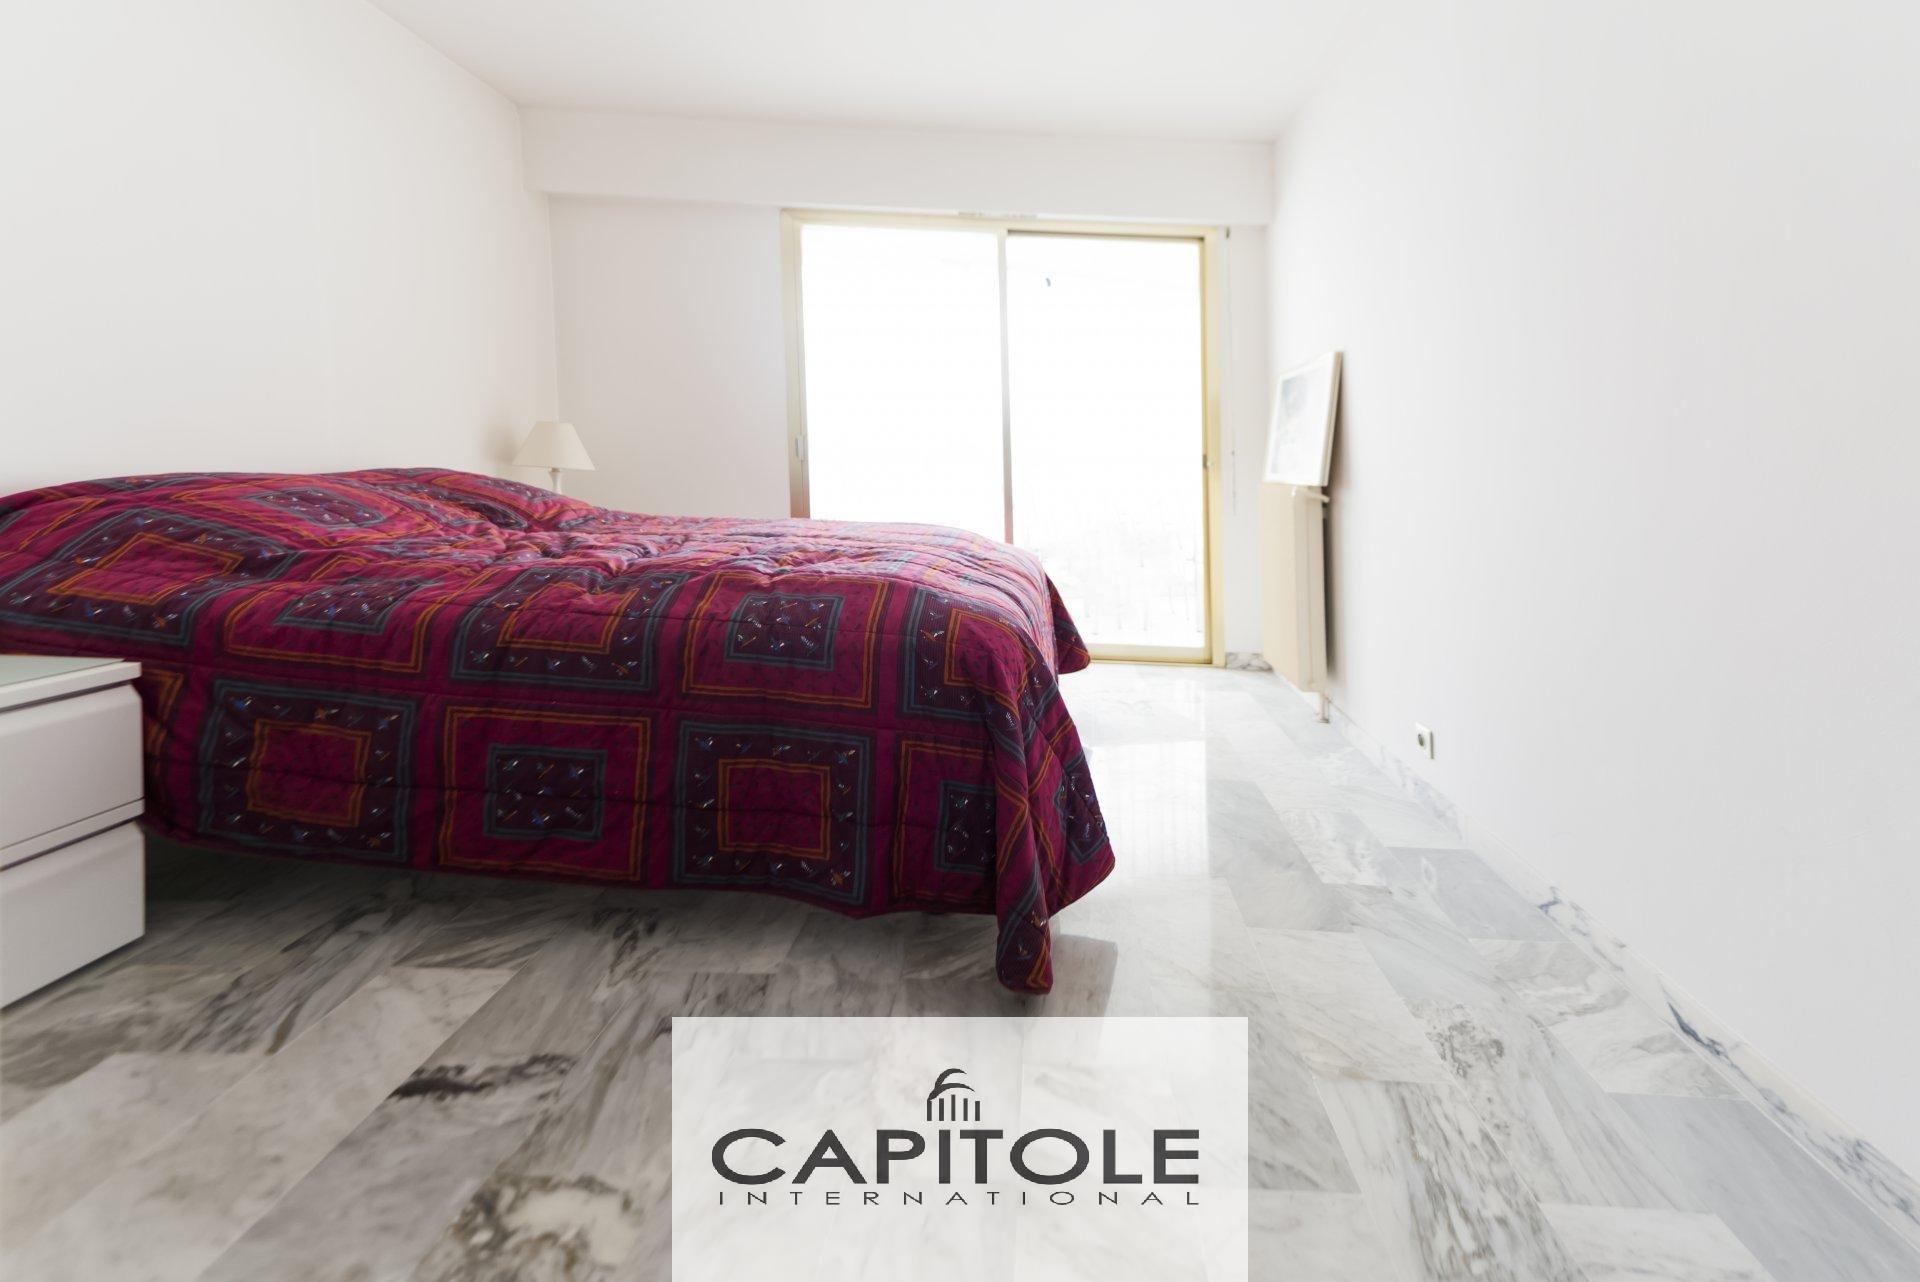 For sale, Juan Les Pins, town center, 1 bedroom apartment, terrace, sea view, parking space